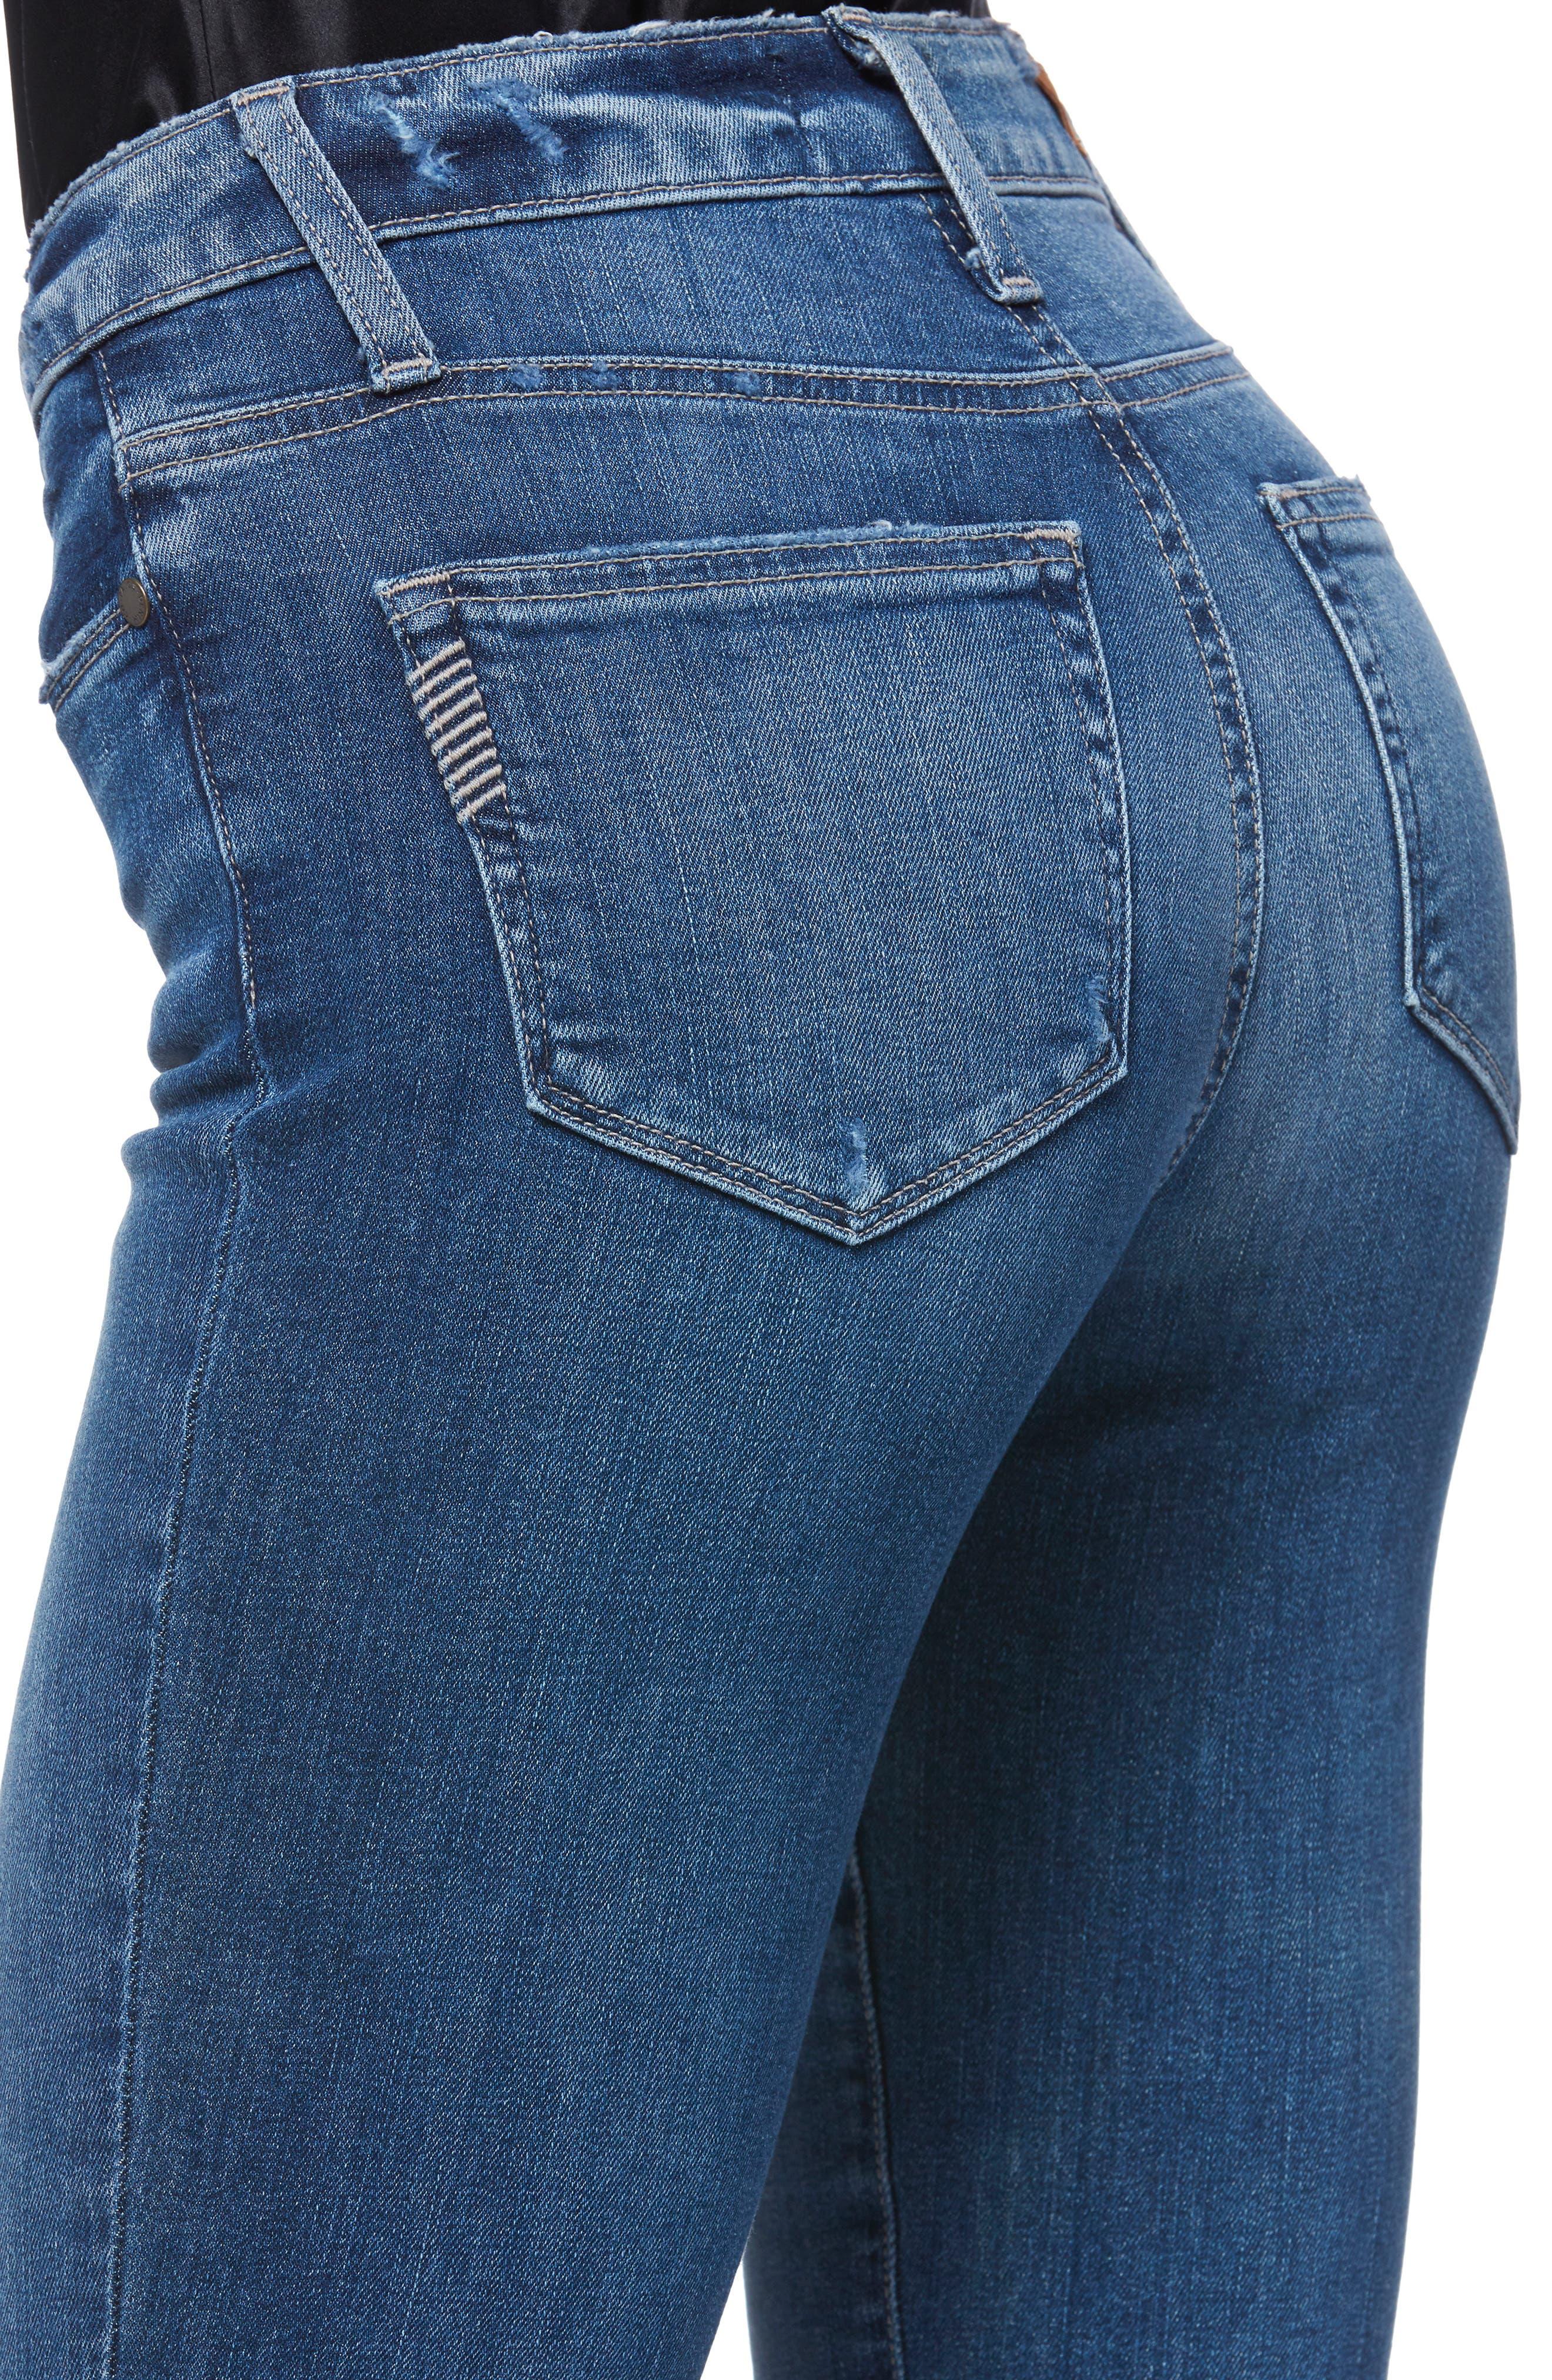 Transcend Vintage - Hoxton High Waist Ankle Straight Leg Jeans,                             Alternate thumbnail 4, color,                             MALIBU